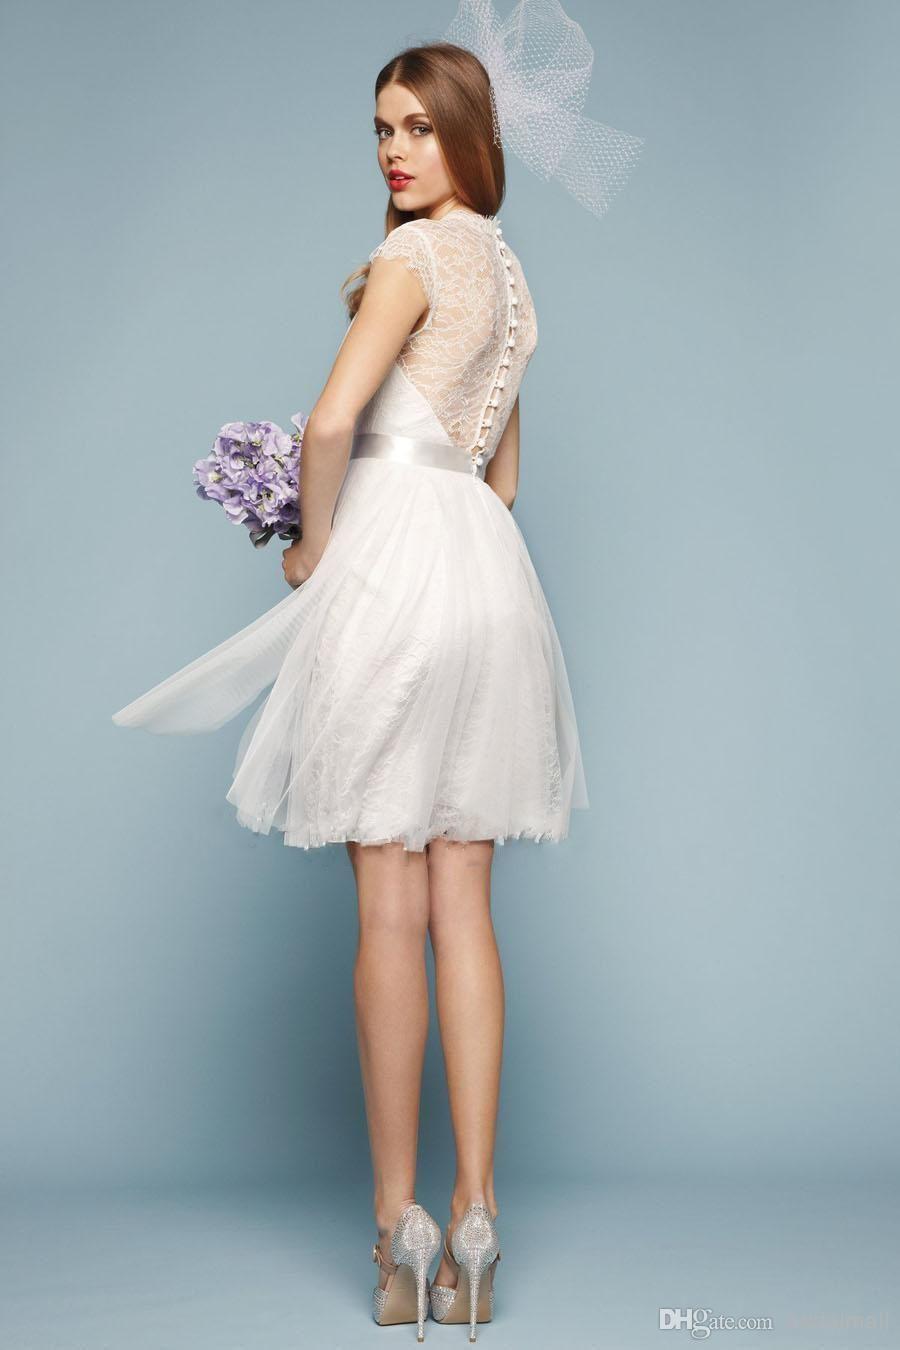 Beautiful 2014 Short Wedding Dresses Photos - All Wedding Dresses ...